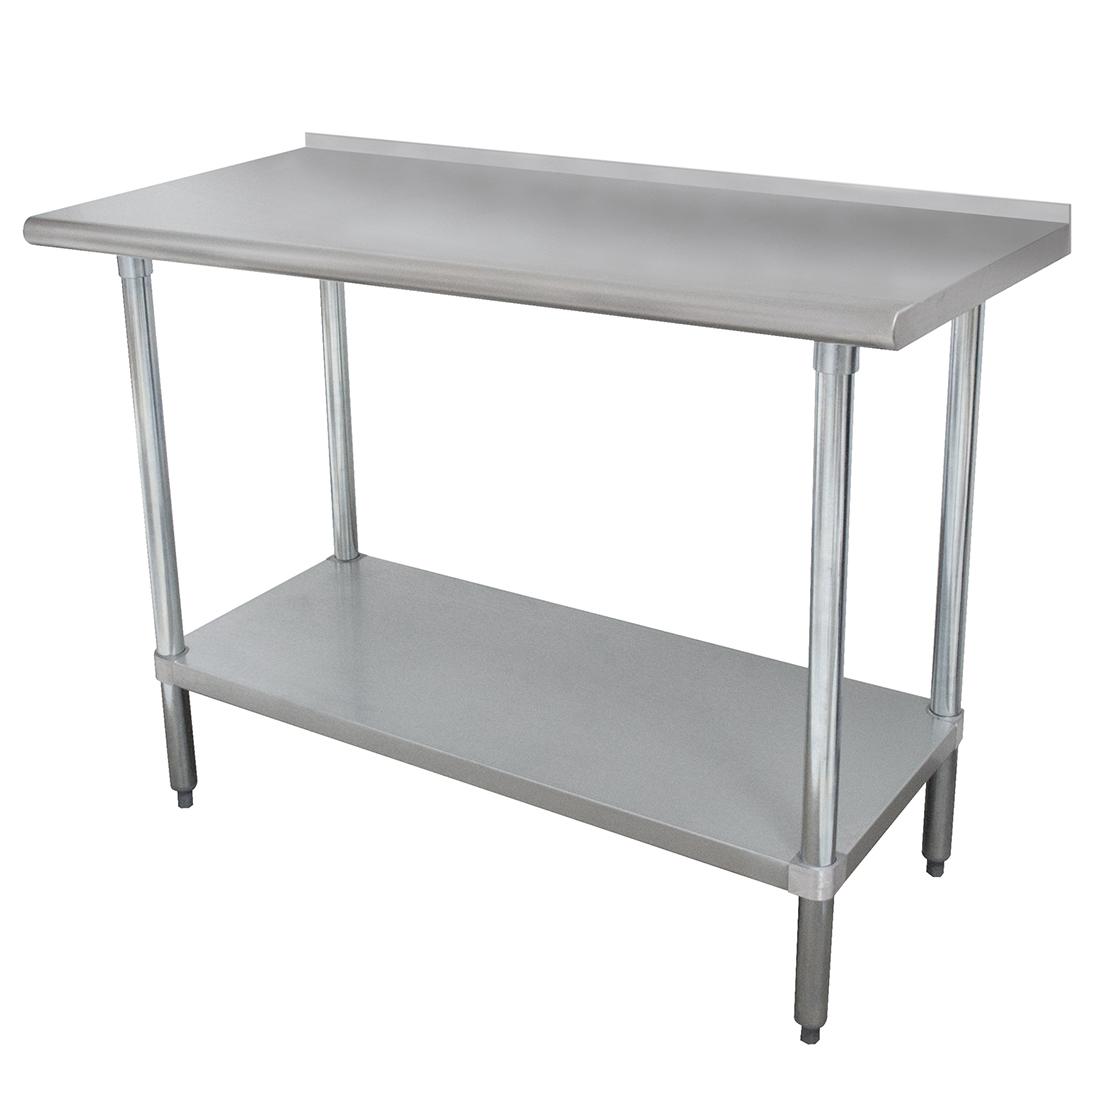 Advance Tabco SFG-305 work table,  54